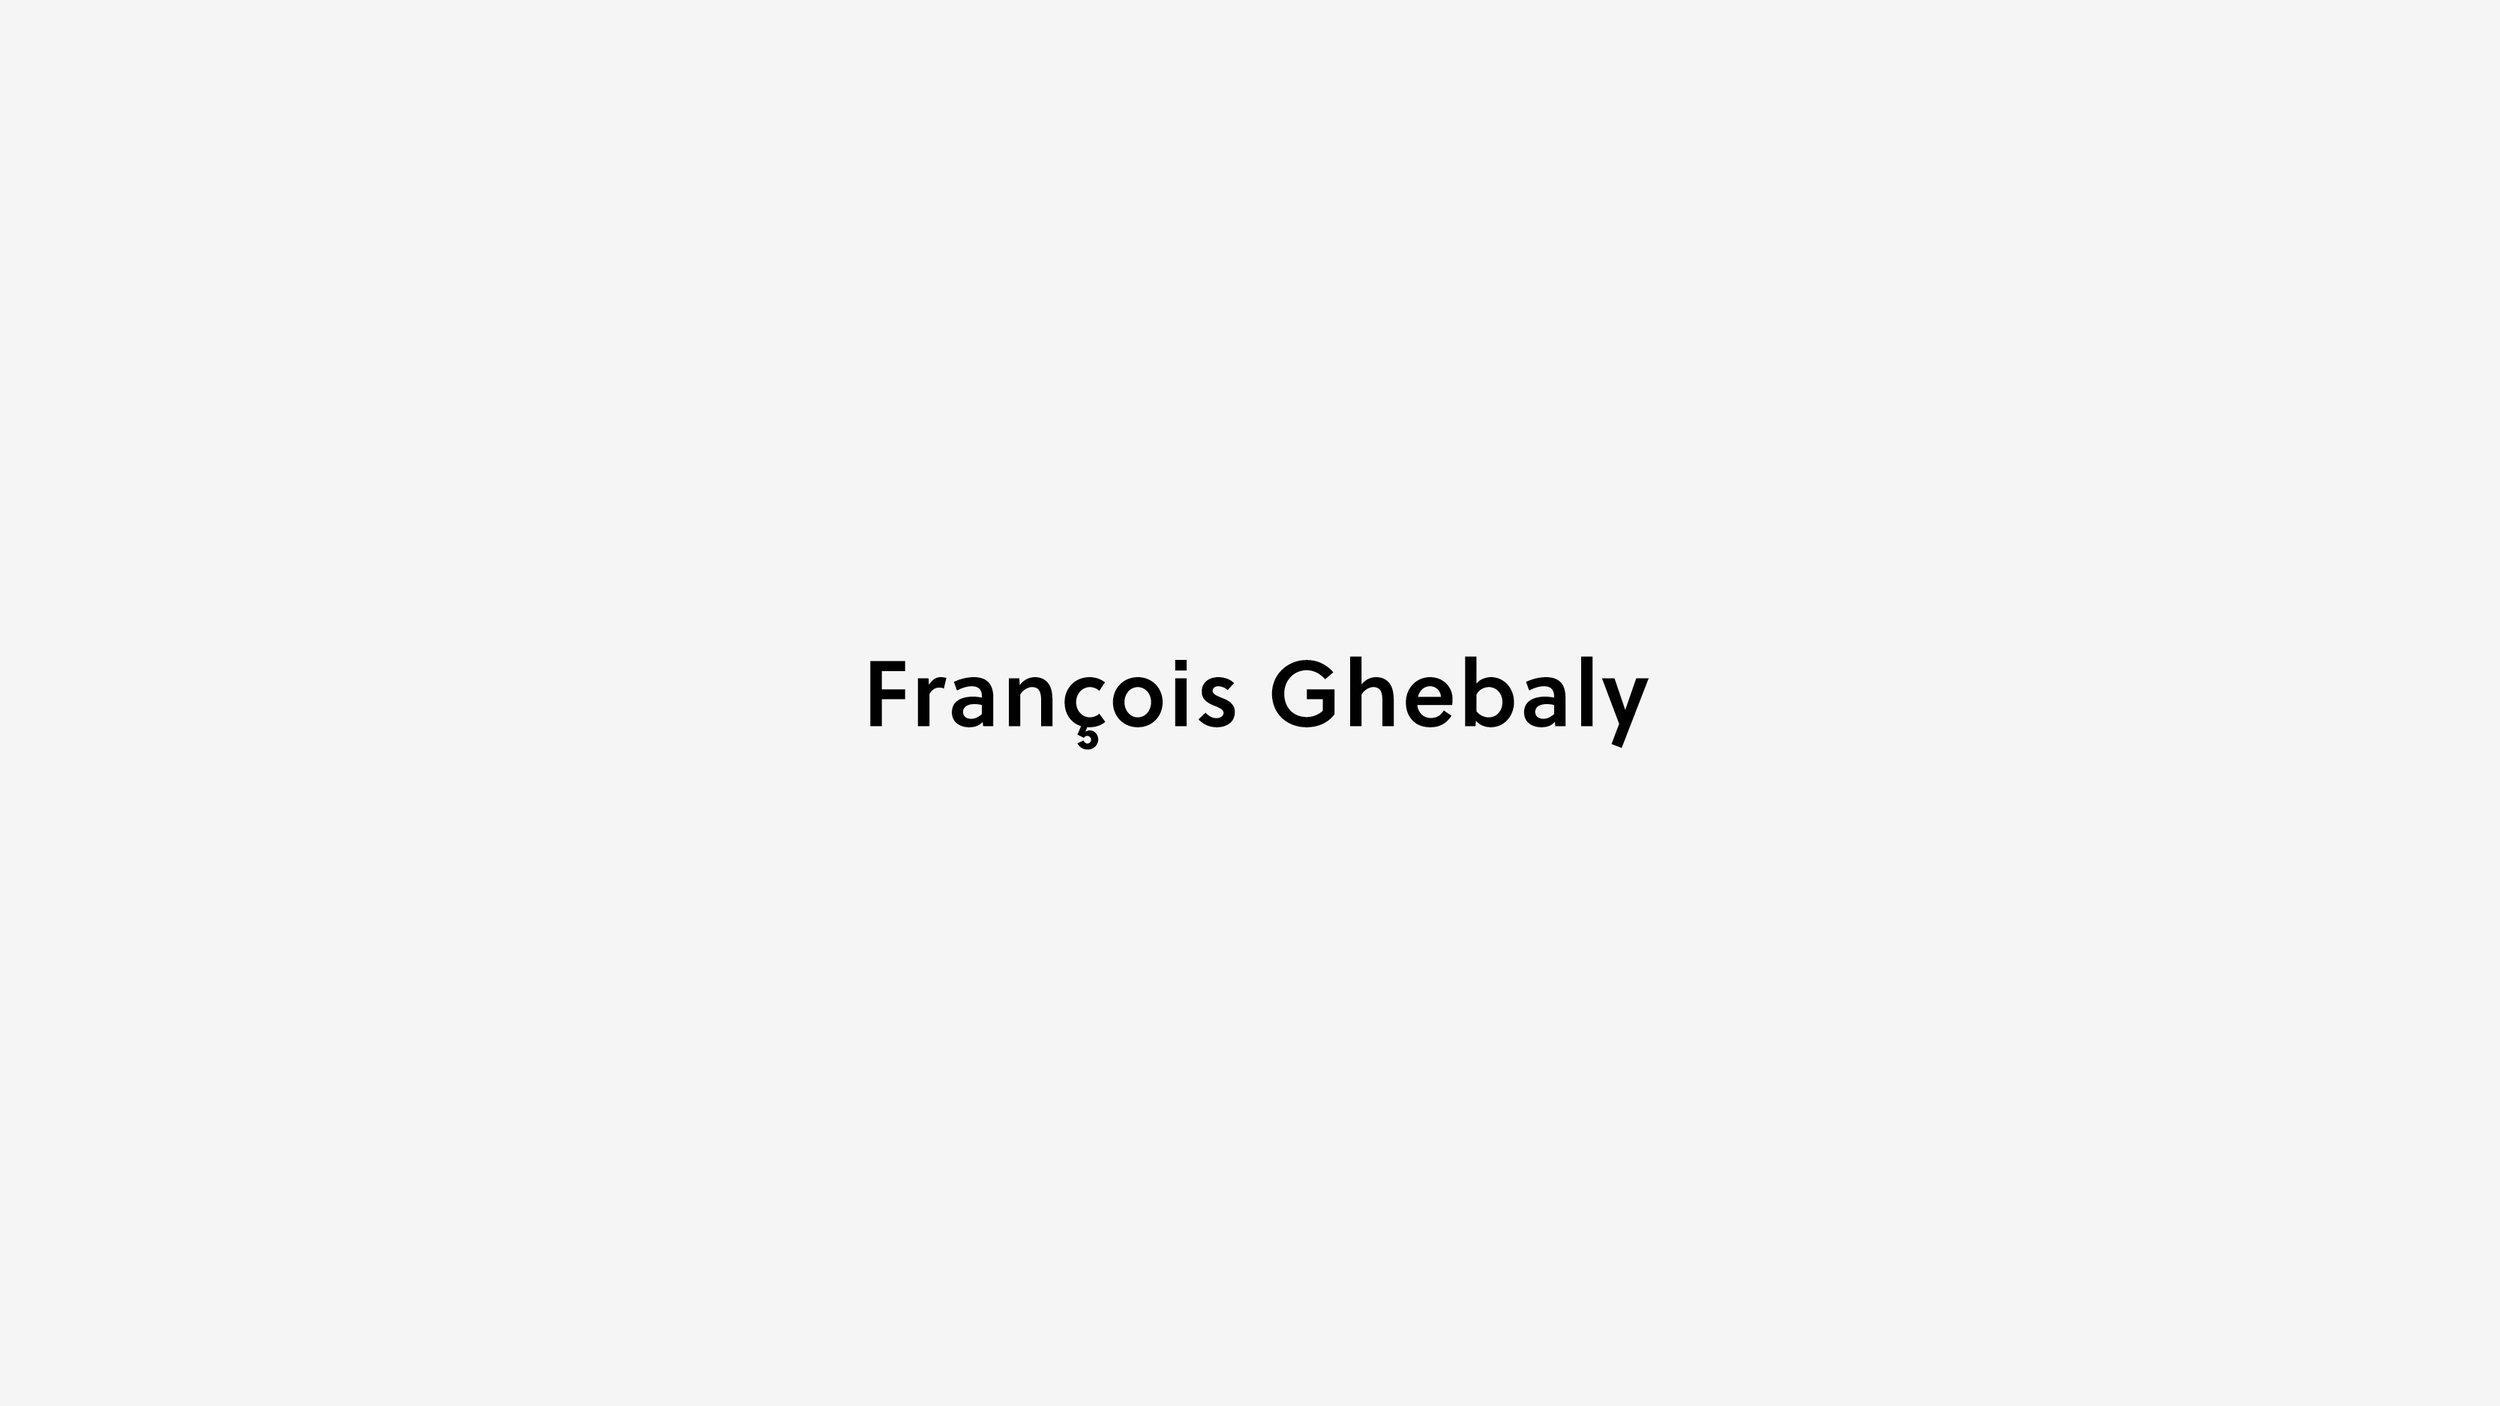 Francois-Ghebaly-Logo.jpg